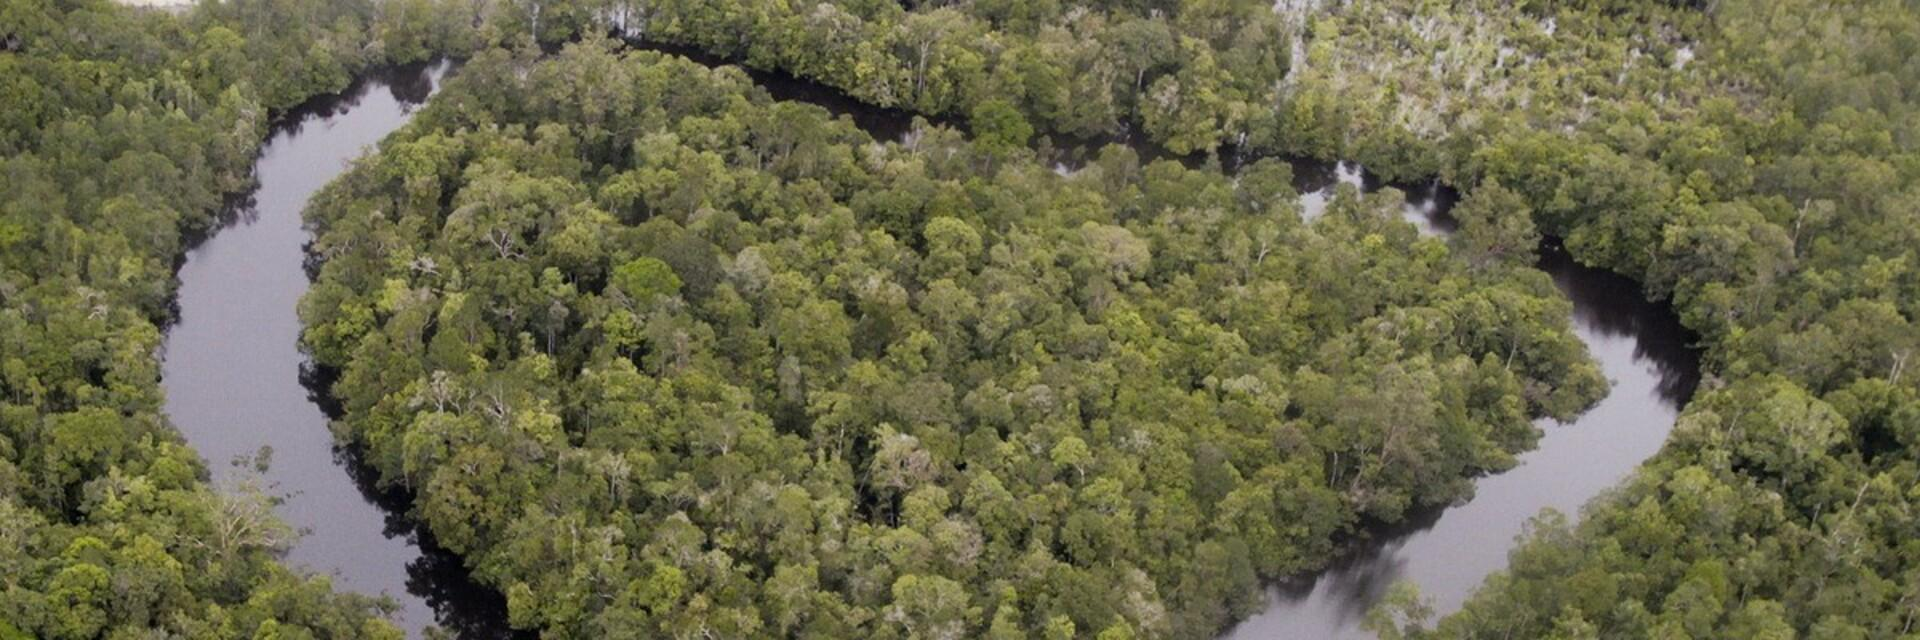 Aerials of Deforestation